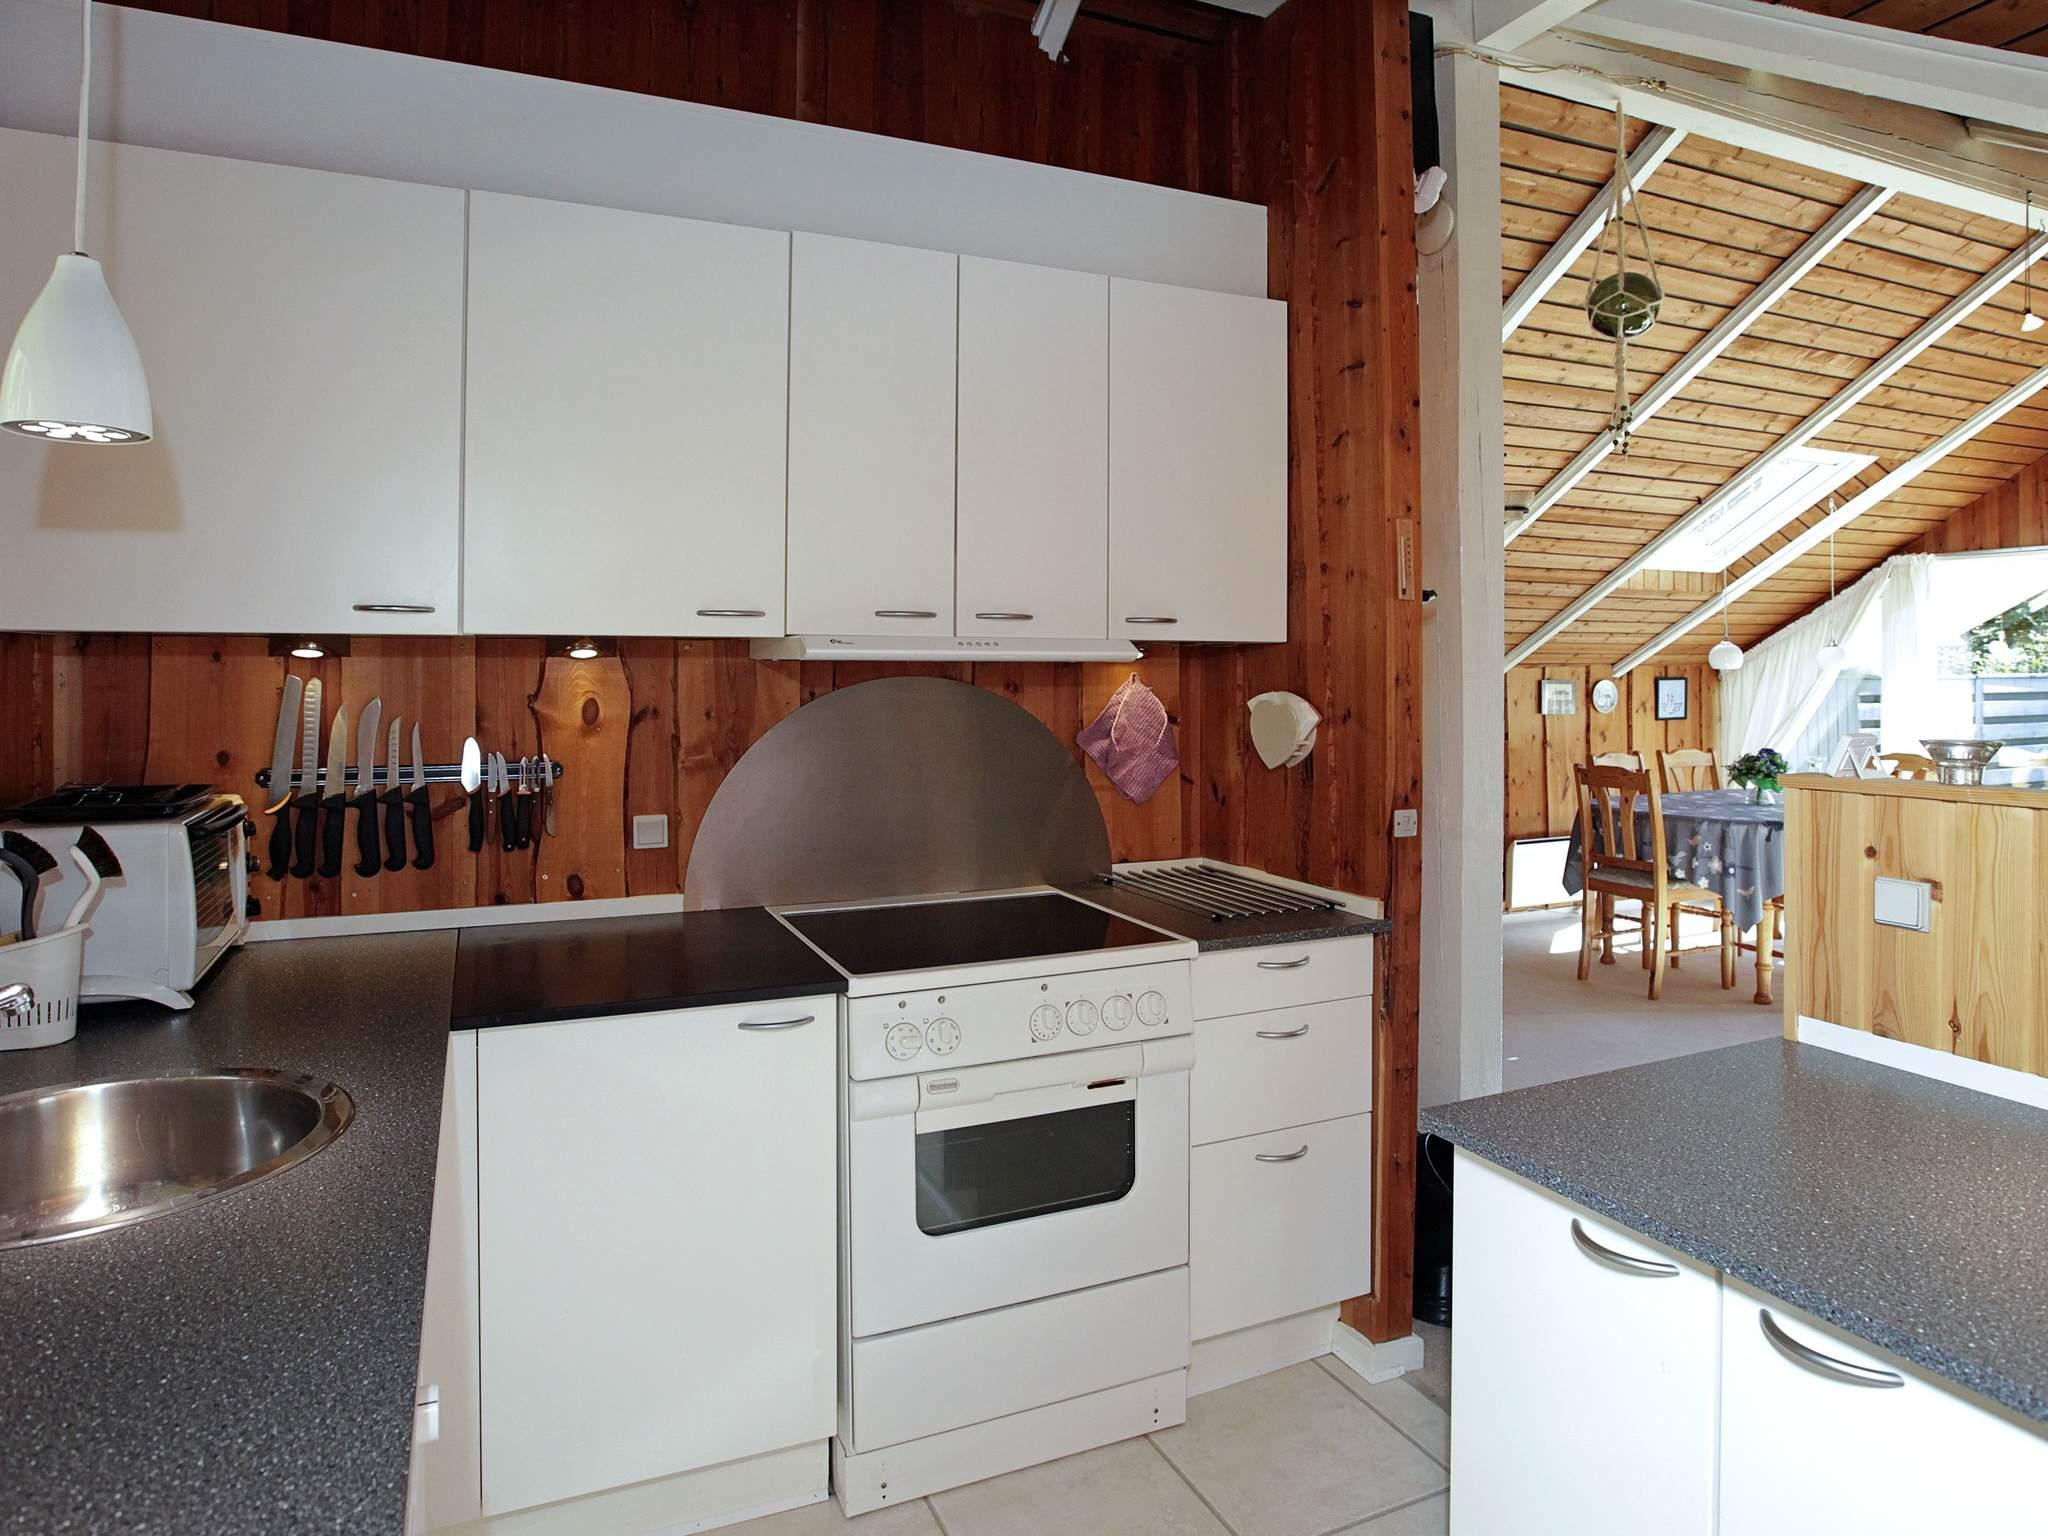 Ferienhaus Hou Nord/Melholt (88048), Hou, , Nordostjütland, Dänemark, Bild 3